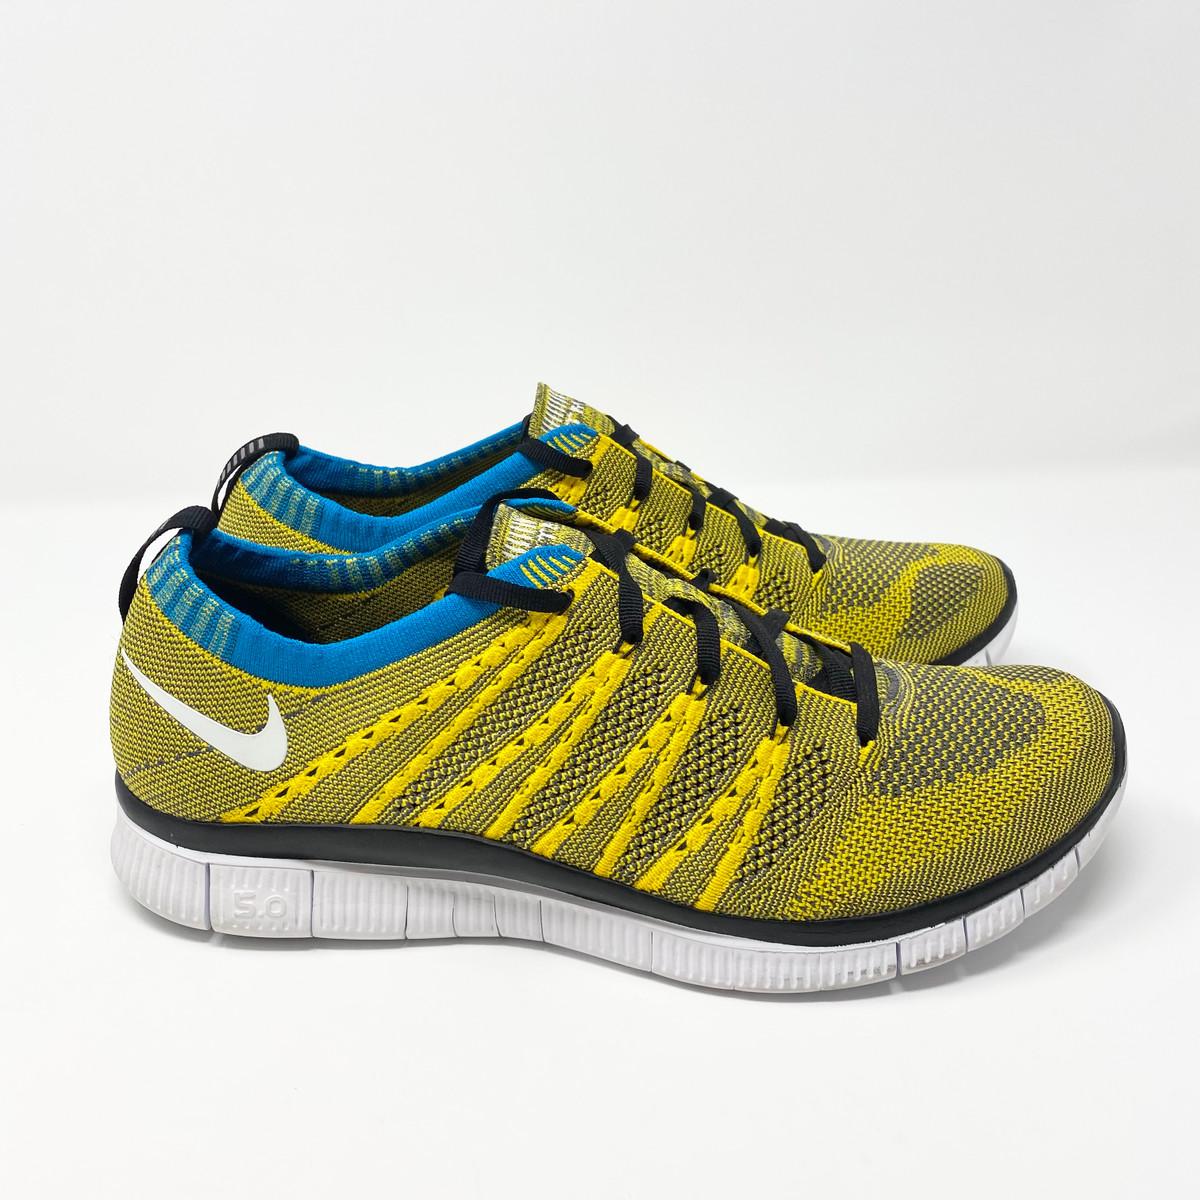 Nike Flyknit Free HTM Tour Yellow